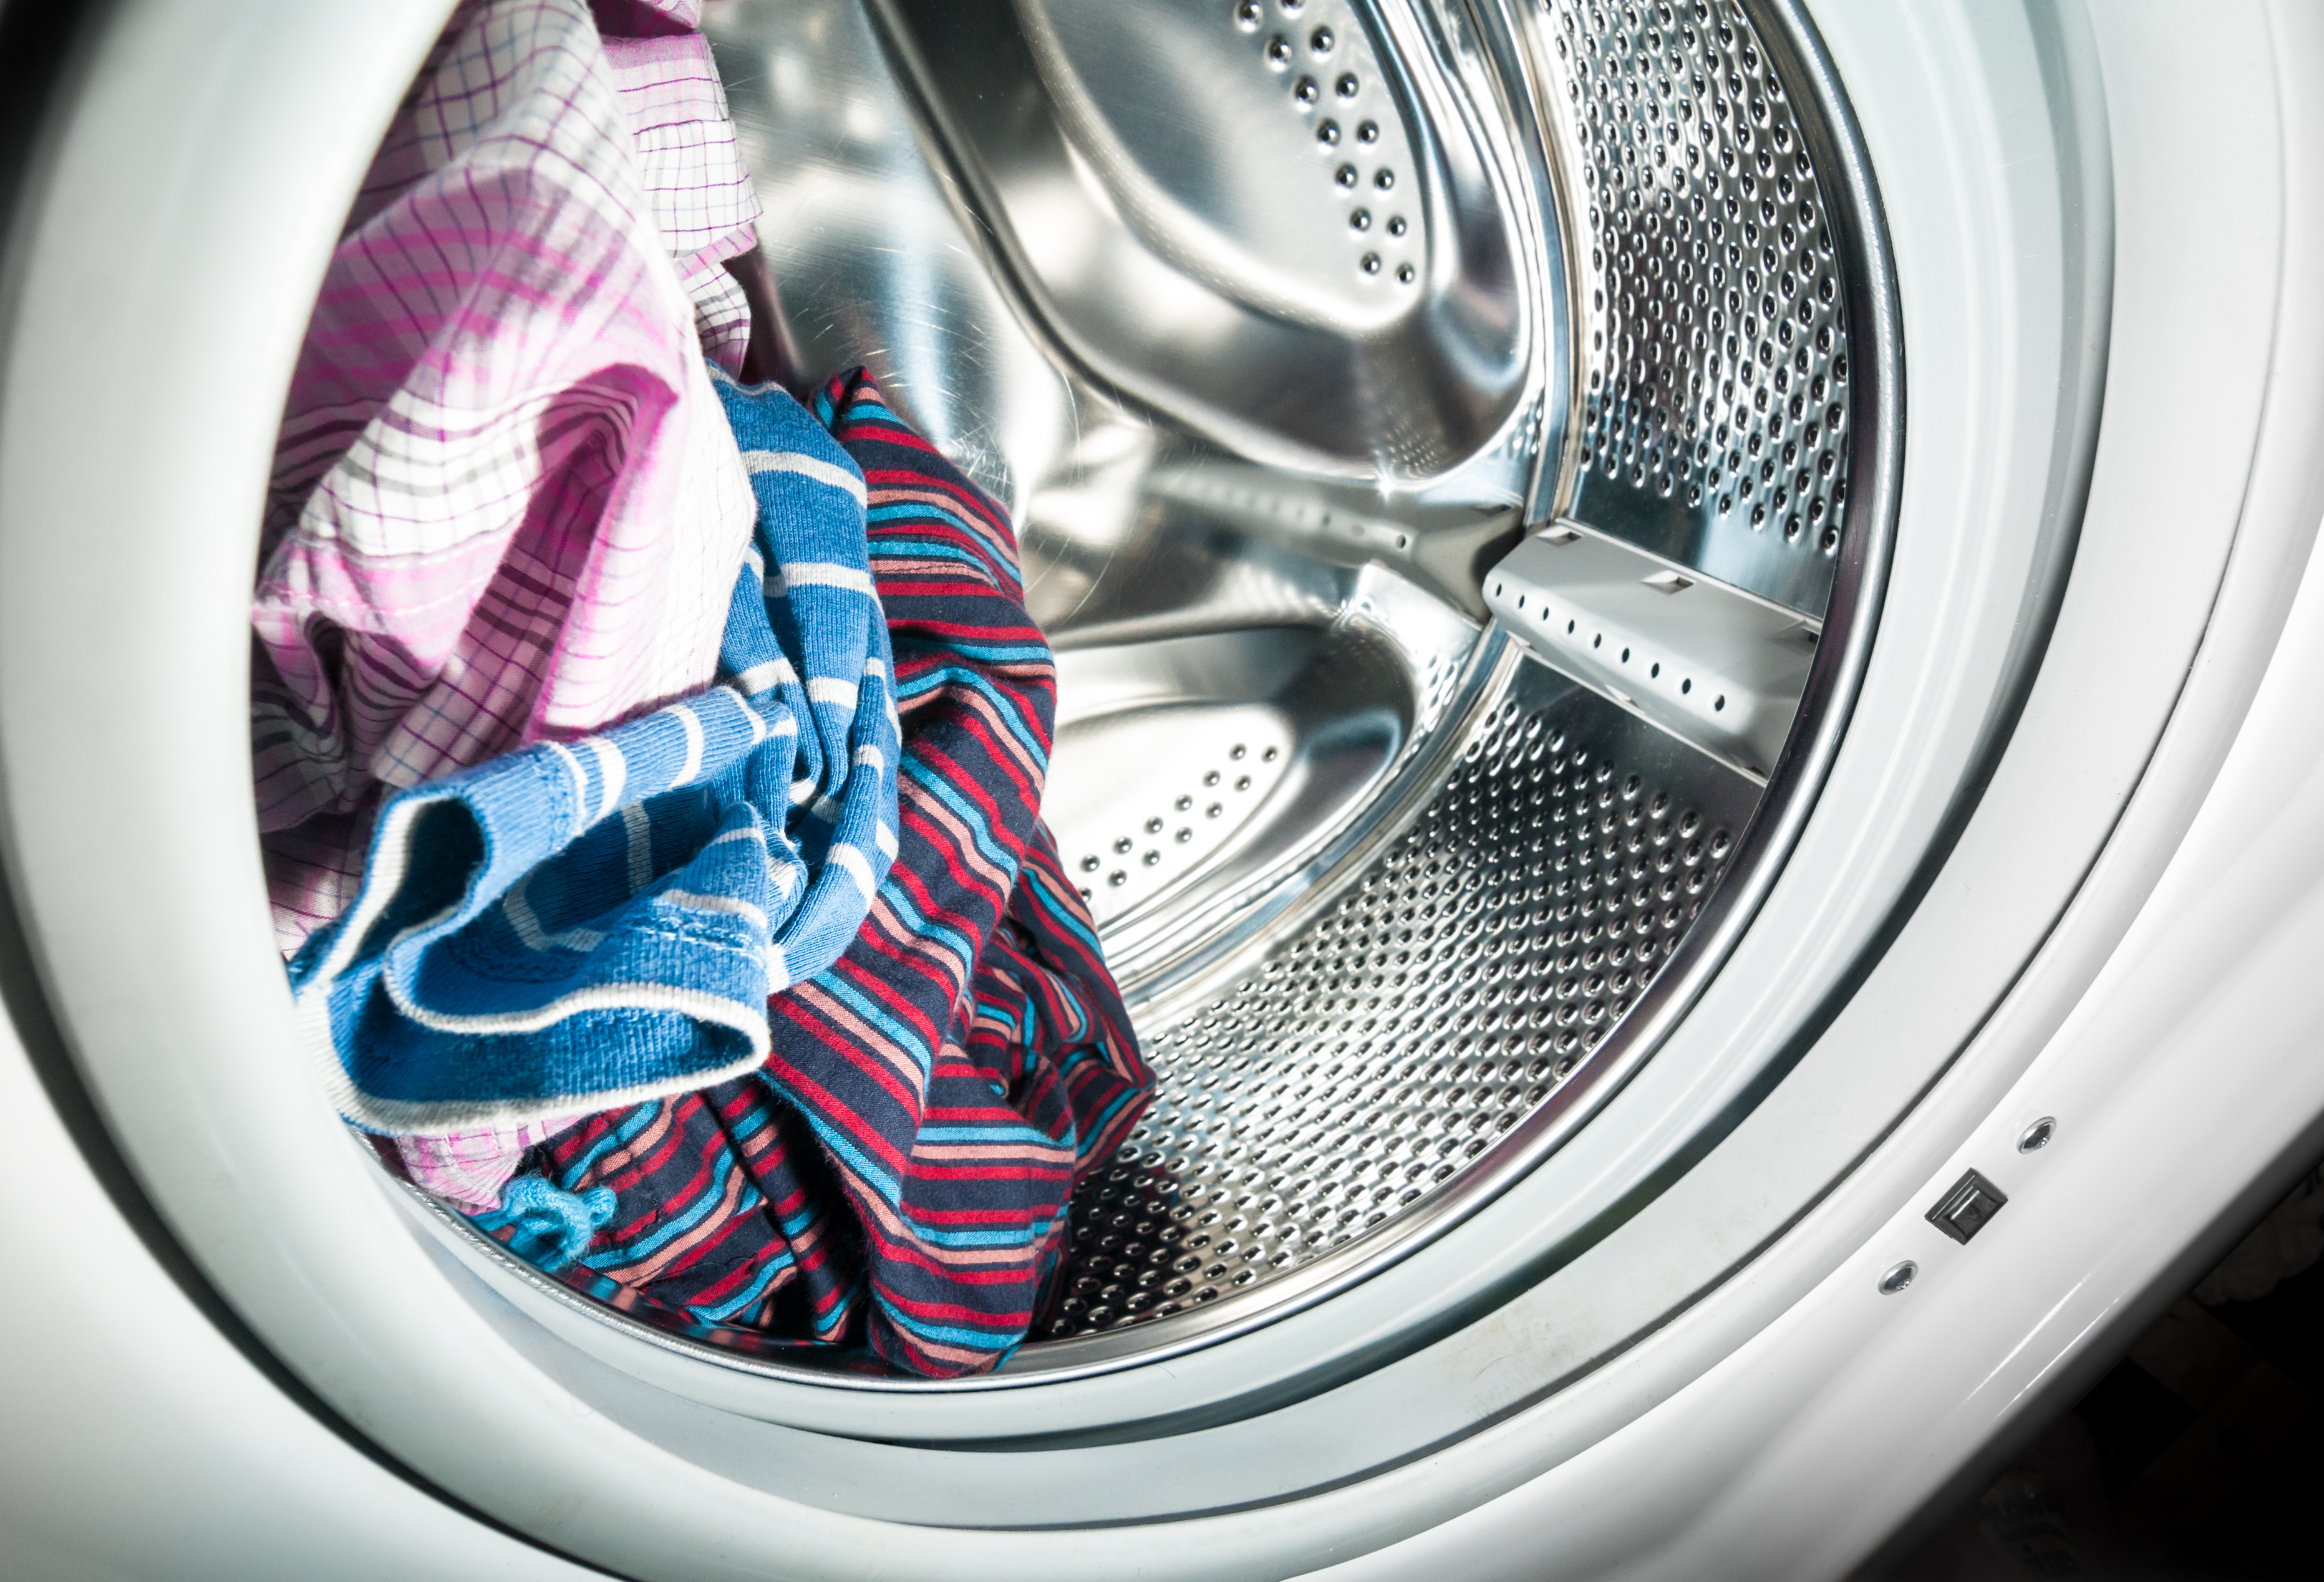 my washing machine smells